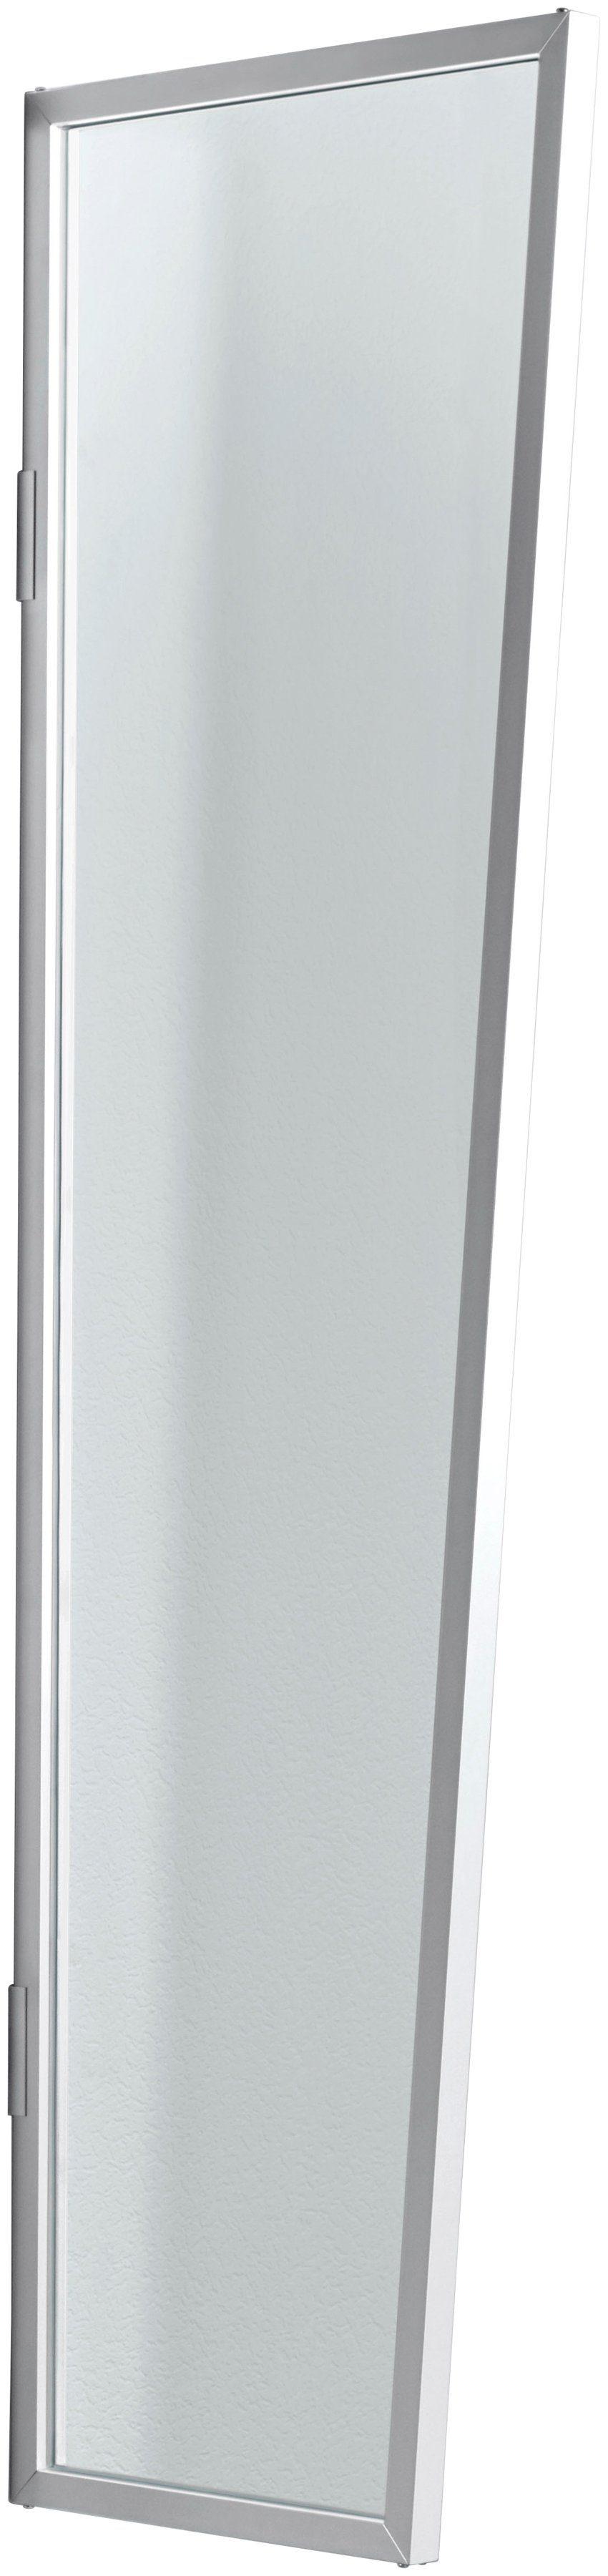 Seitenblende »B1 Acryl«, BxH: 60x200 cm, weiß/transparent